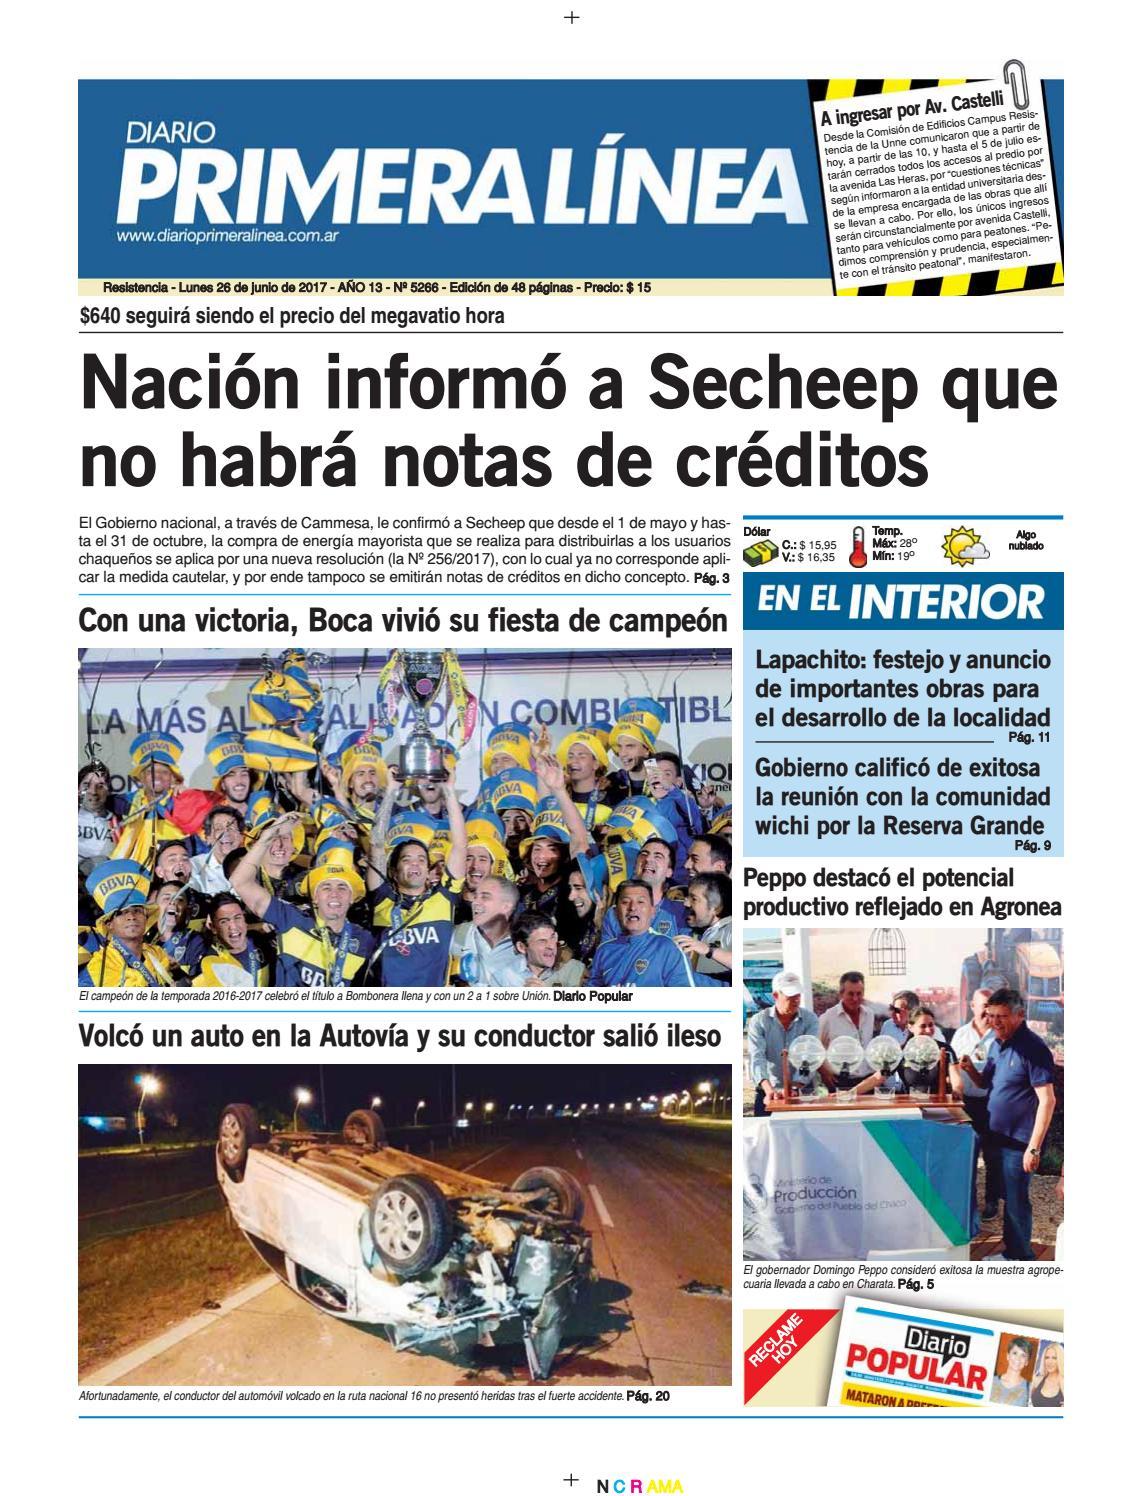 Primera Línea 5267 26 06 17 by Diario Primera Linea - issuu